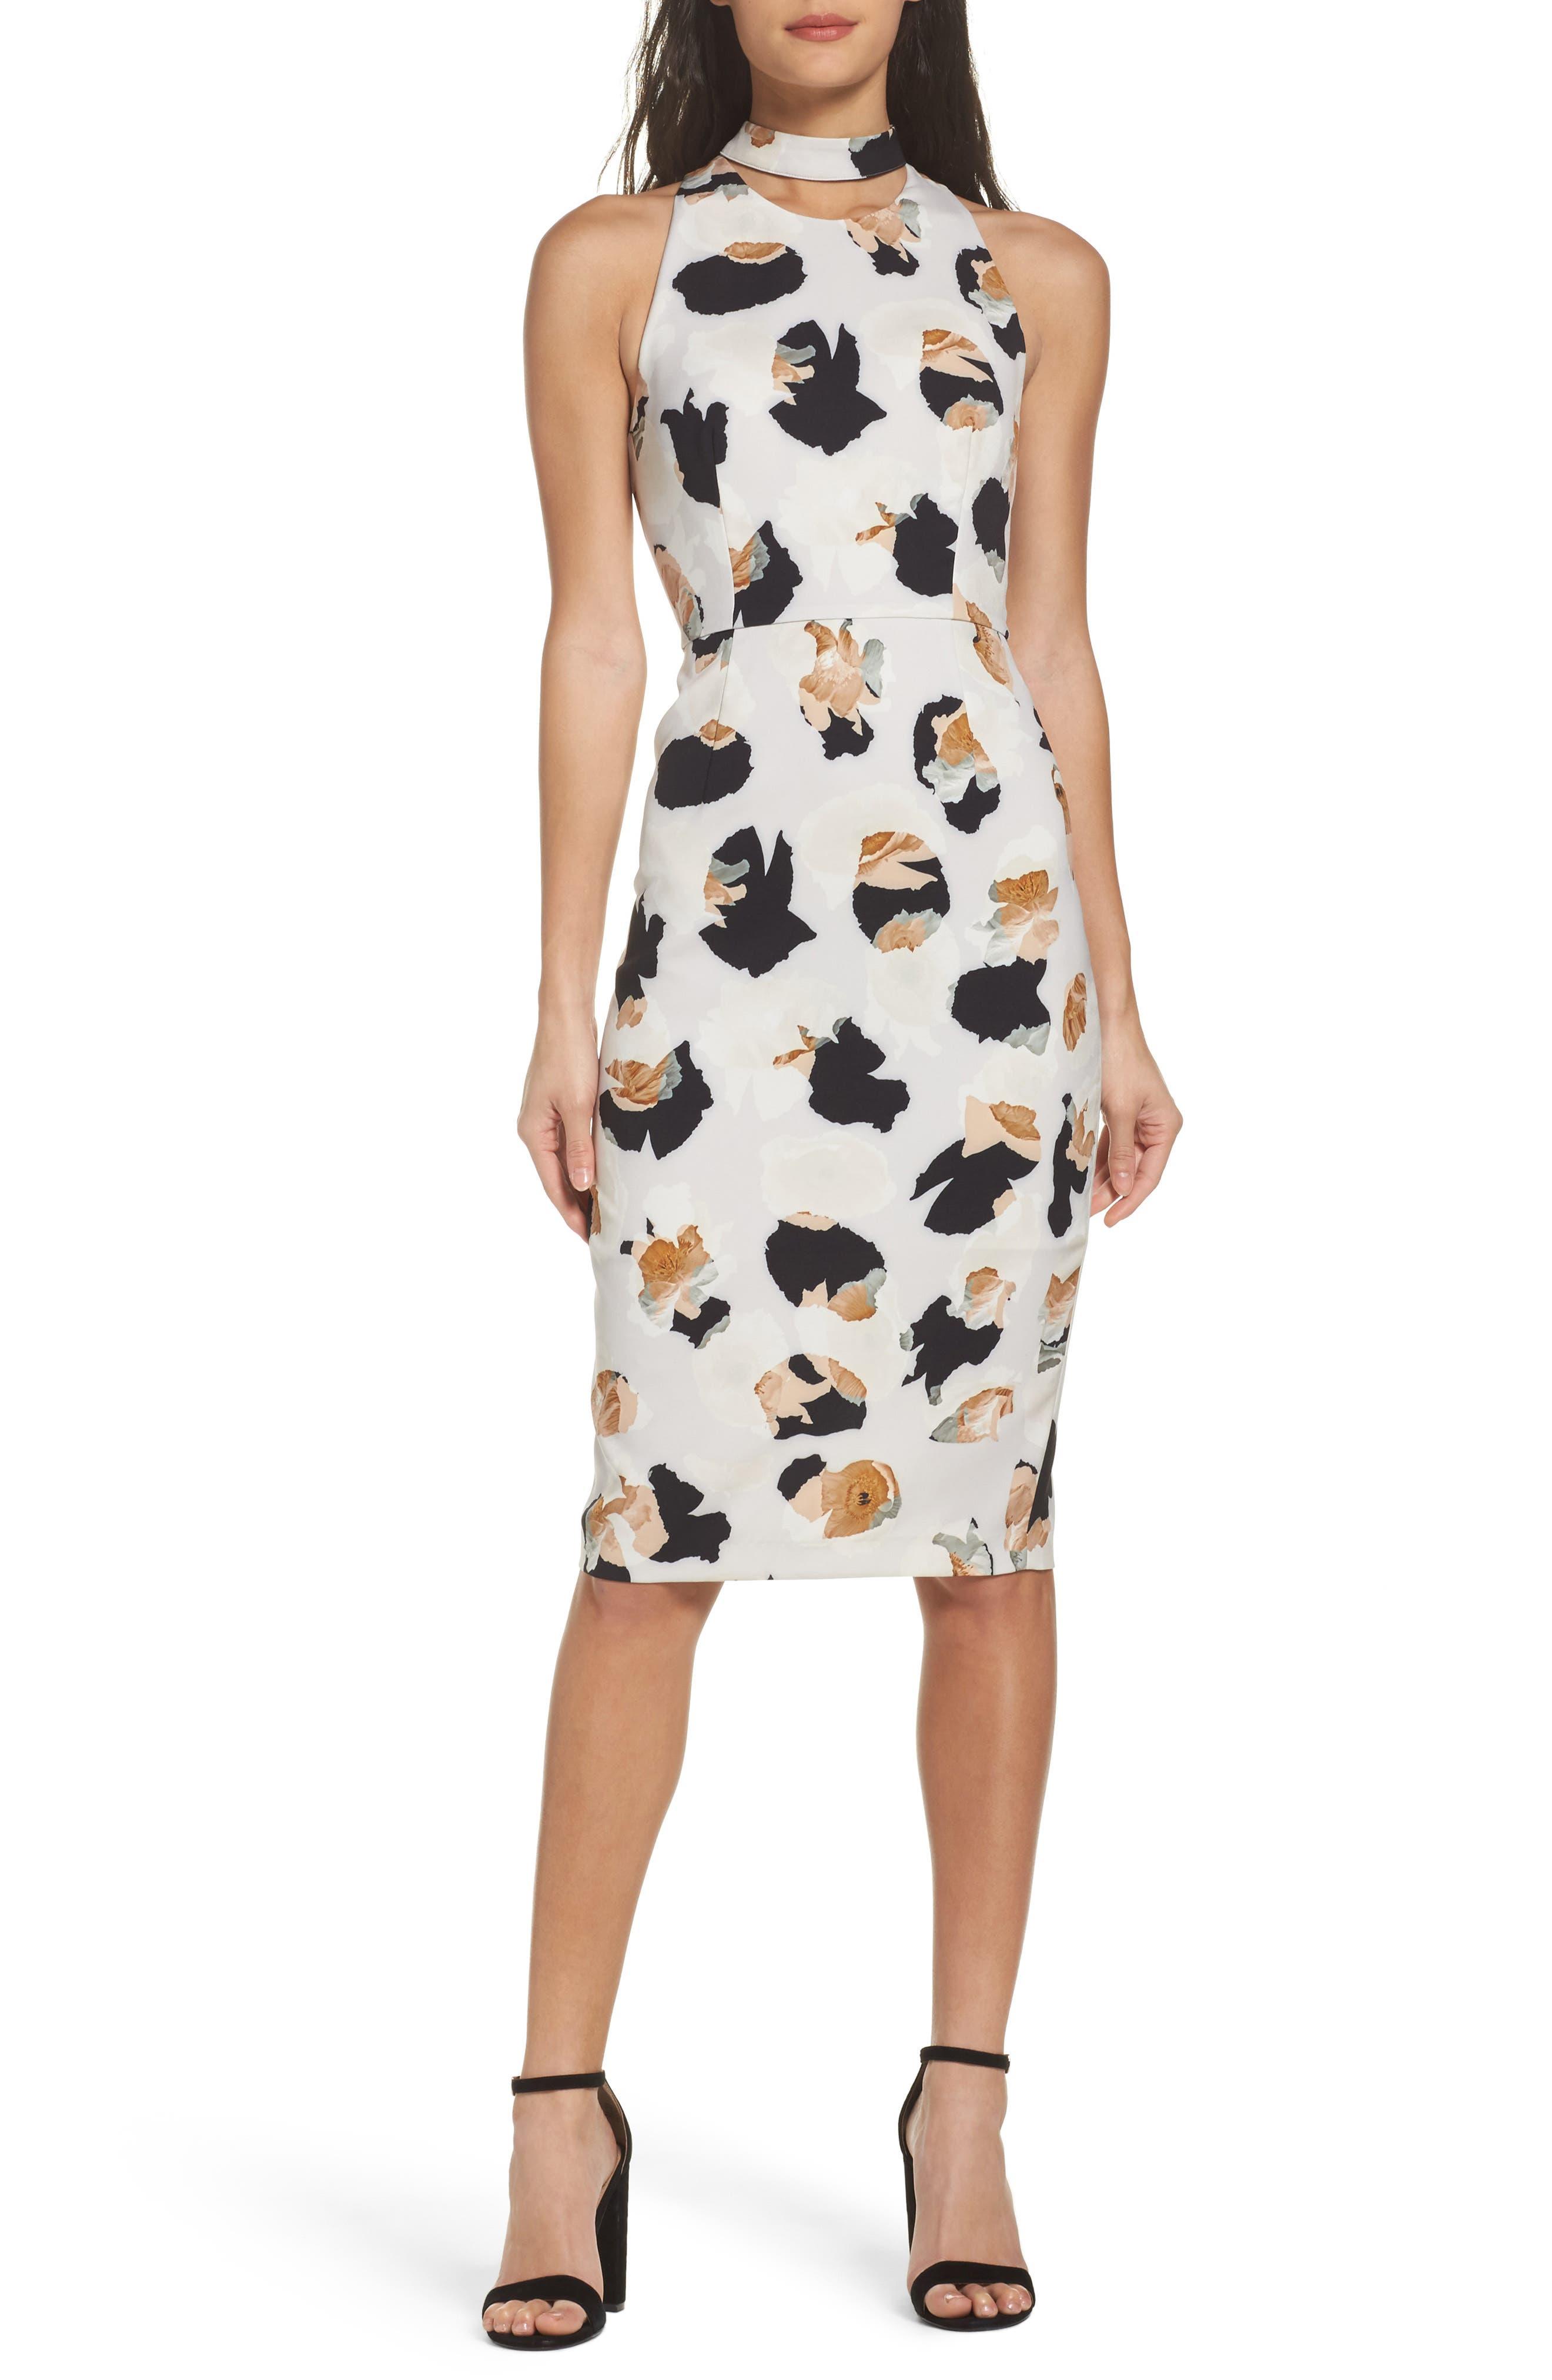 COOPER ST Lovers Liaison Dress